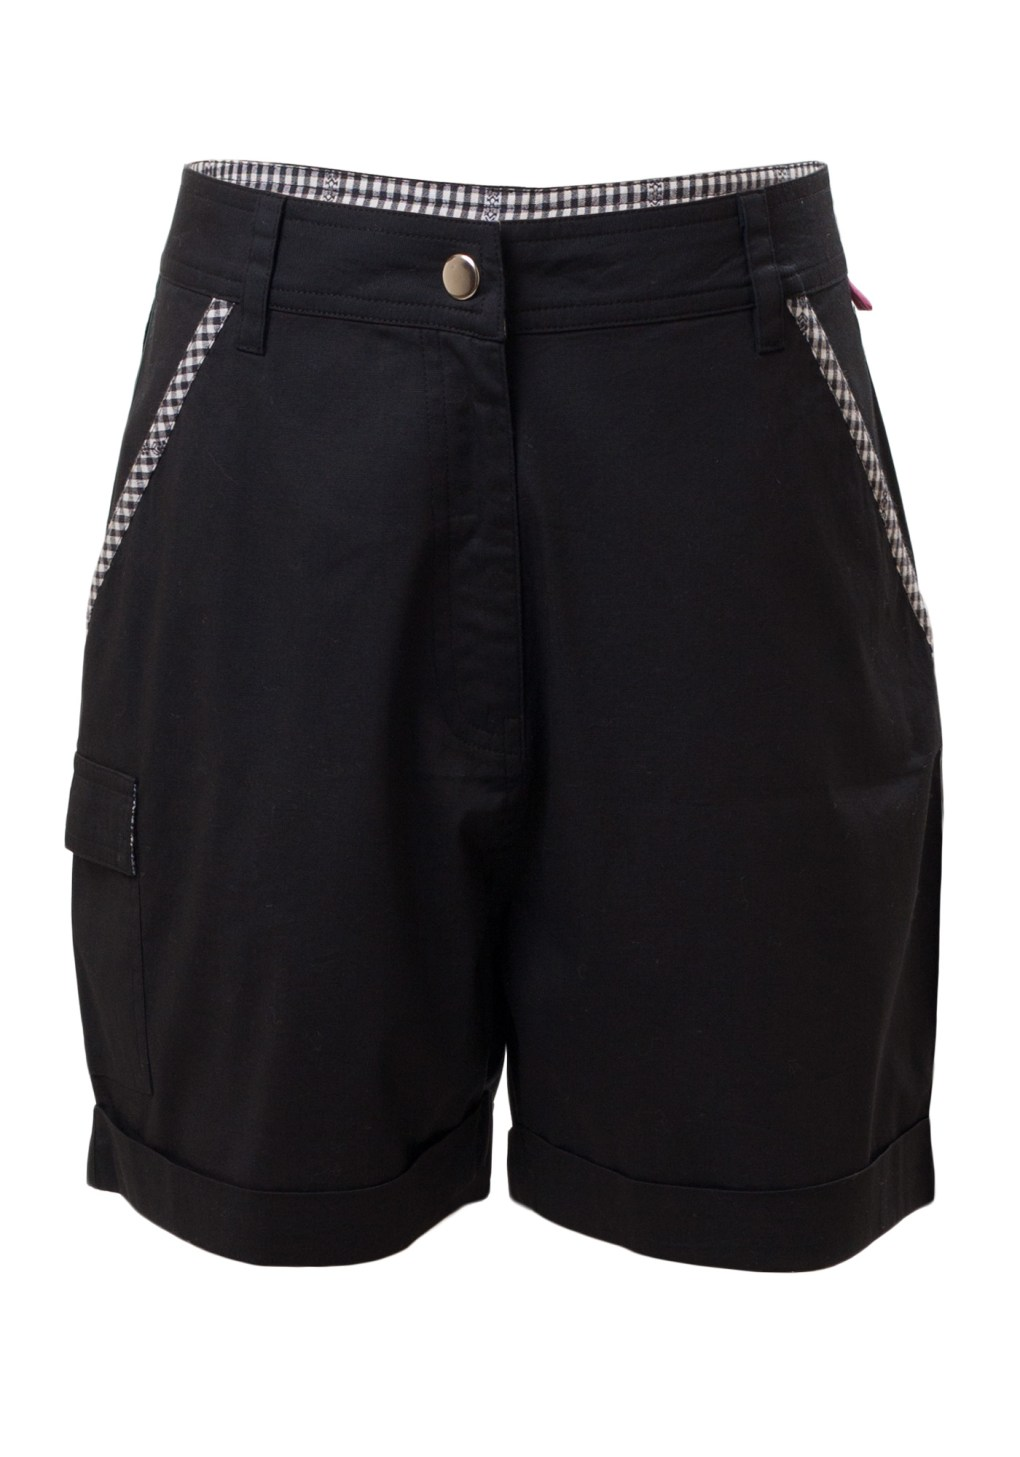 MINC Petite Sober Safari Girls Roll Back Cuff Shorts in Phantom Black Cotton